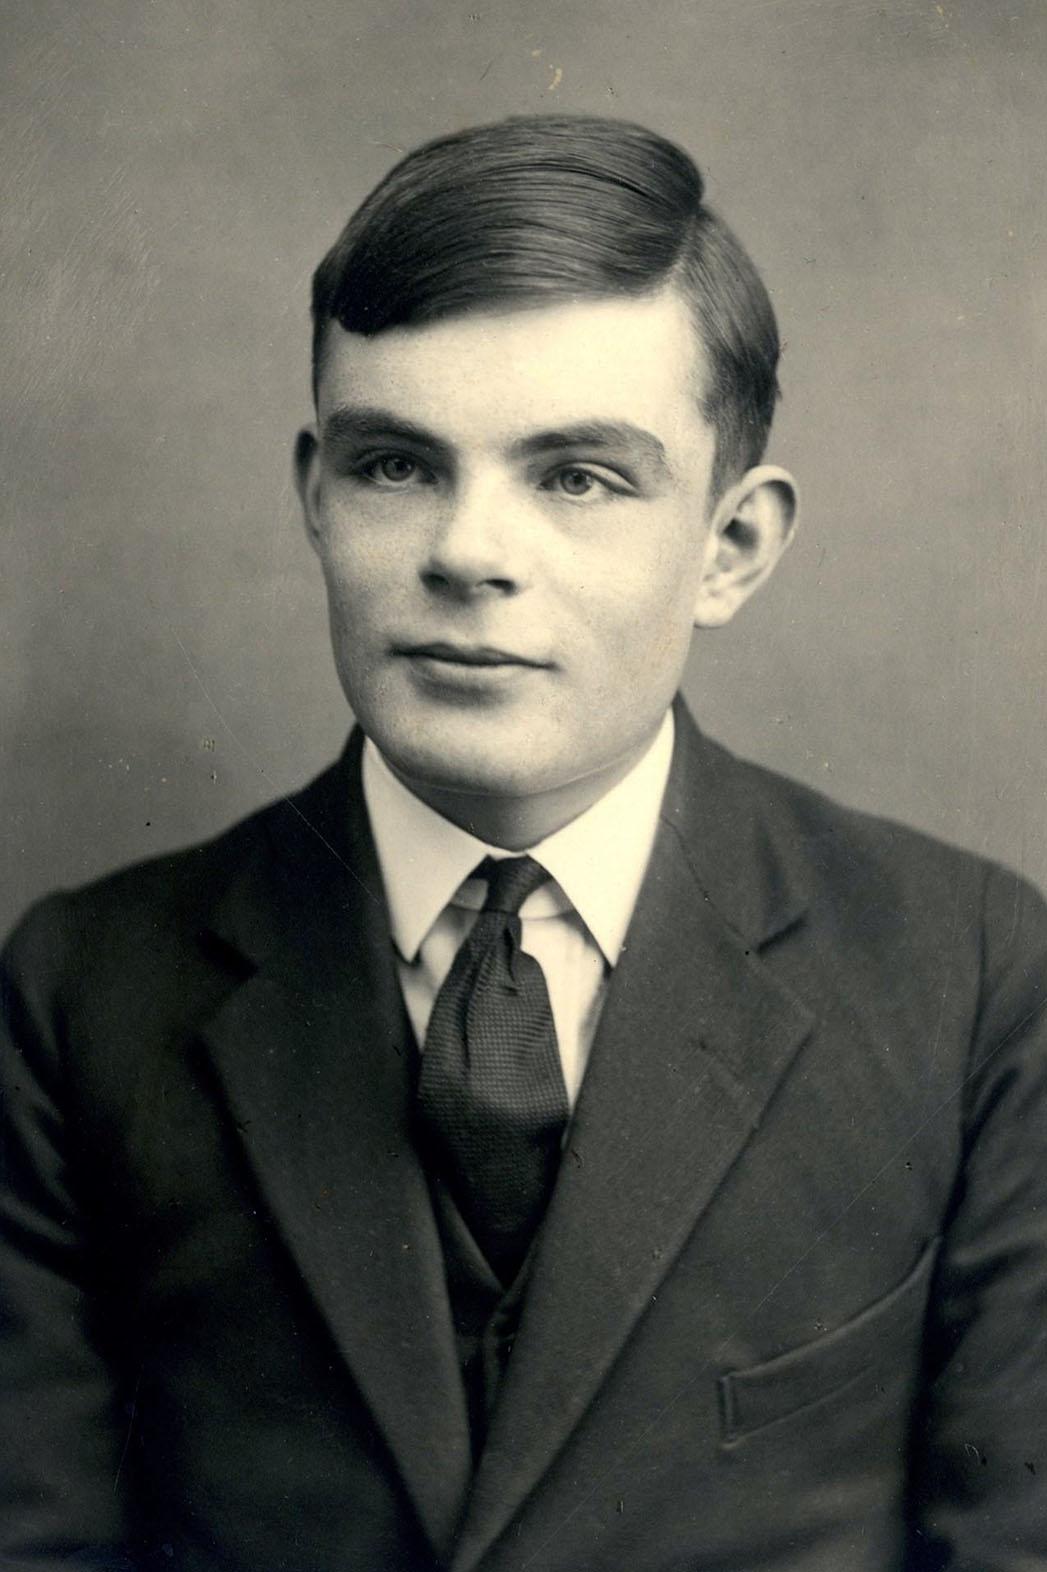 Alan Turing Portrait - P 2014